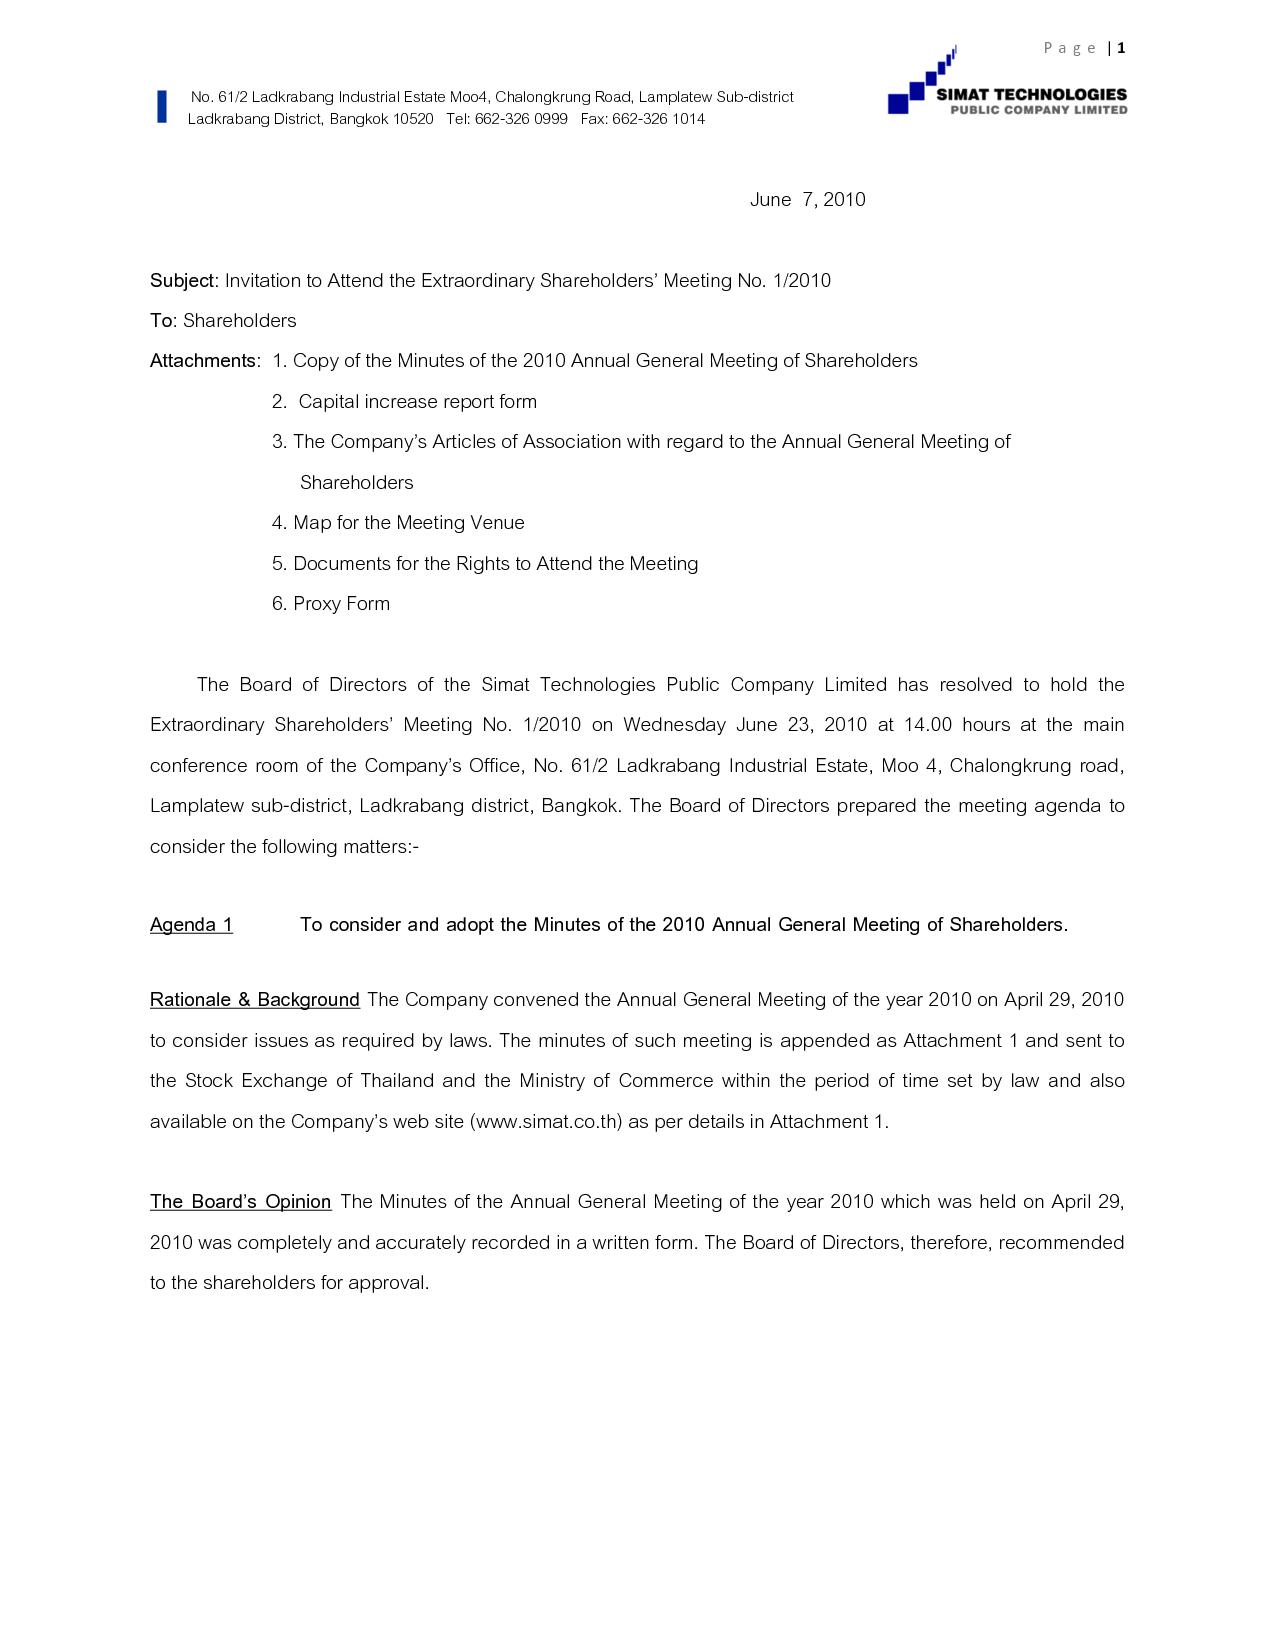 Career Fair Invitation Letter Sample 1275 X 1650